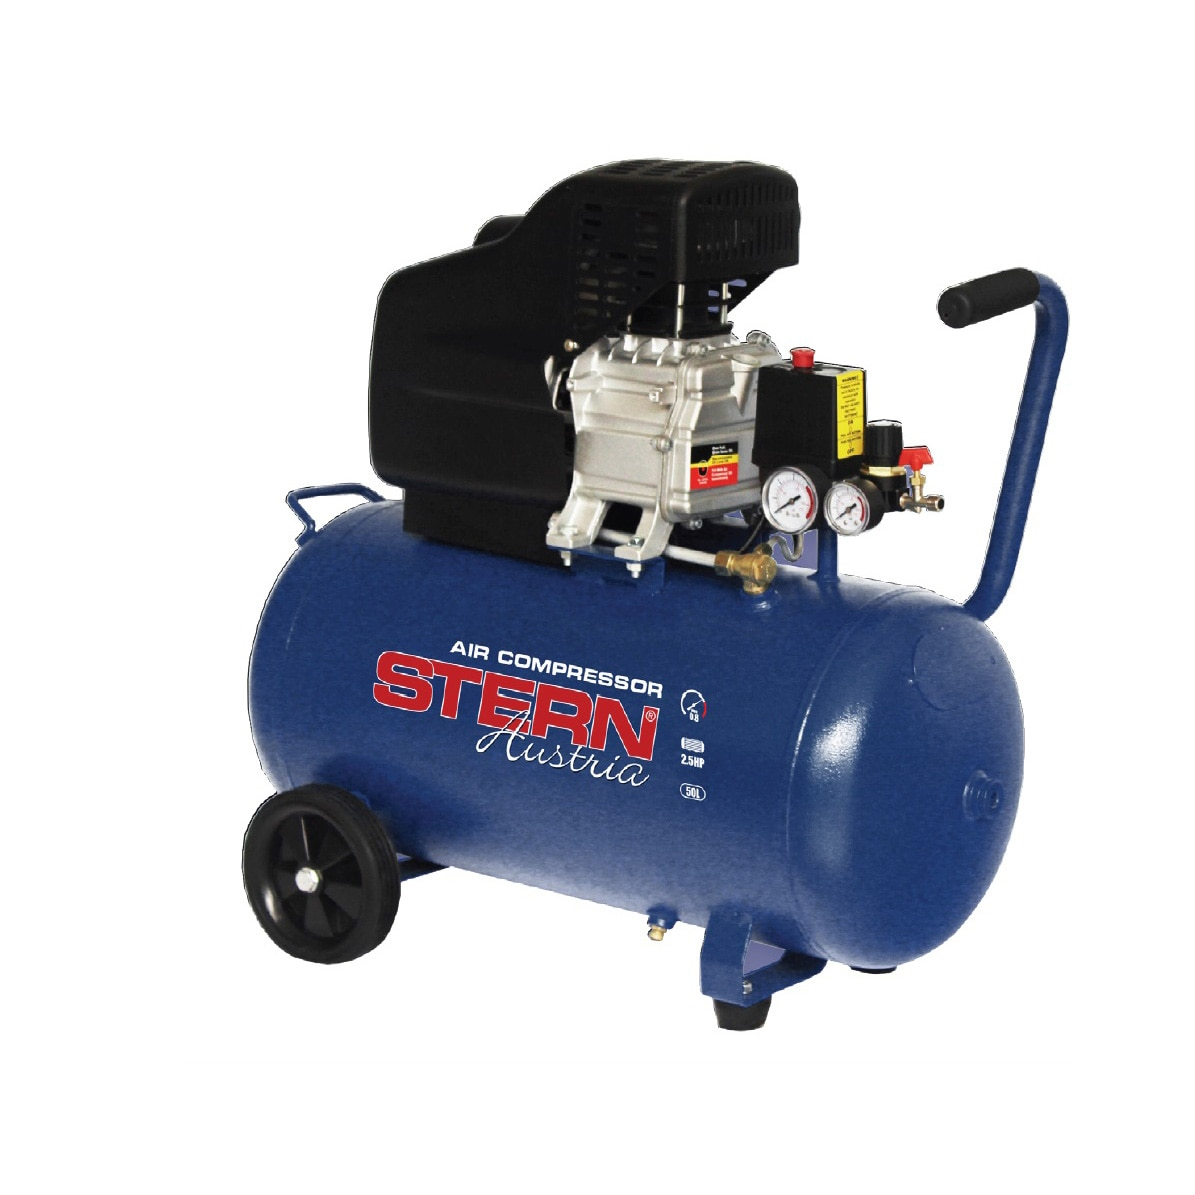 Fotografie Compresor aer STERN CO2550A, 2.5 CP, 8 bar presiune maxima, 50 l volum rezervor, 195 l/min debit aer, cilindru din fonta, regulator presiune